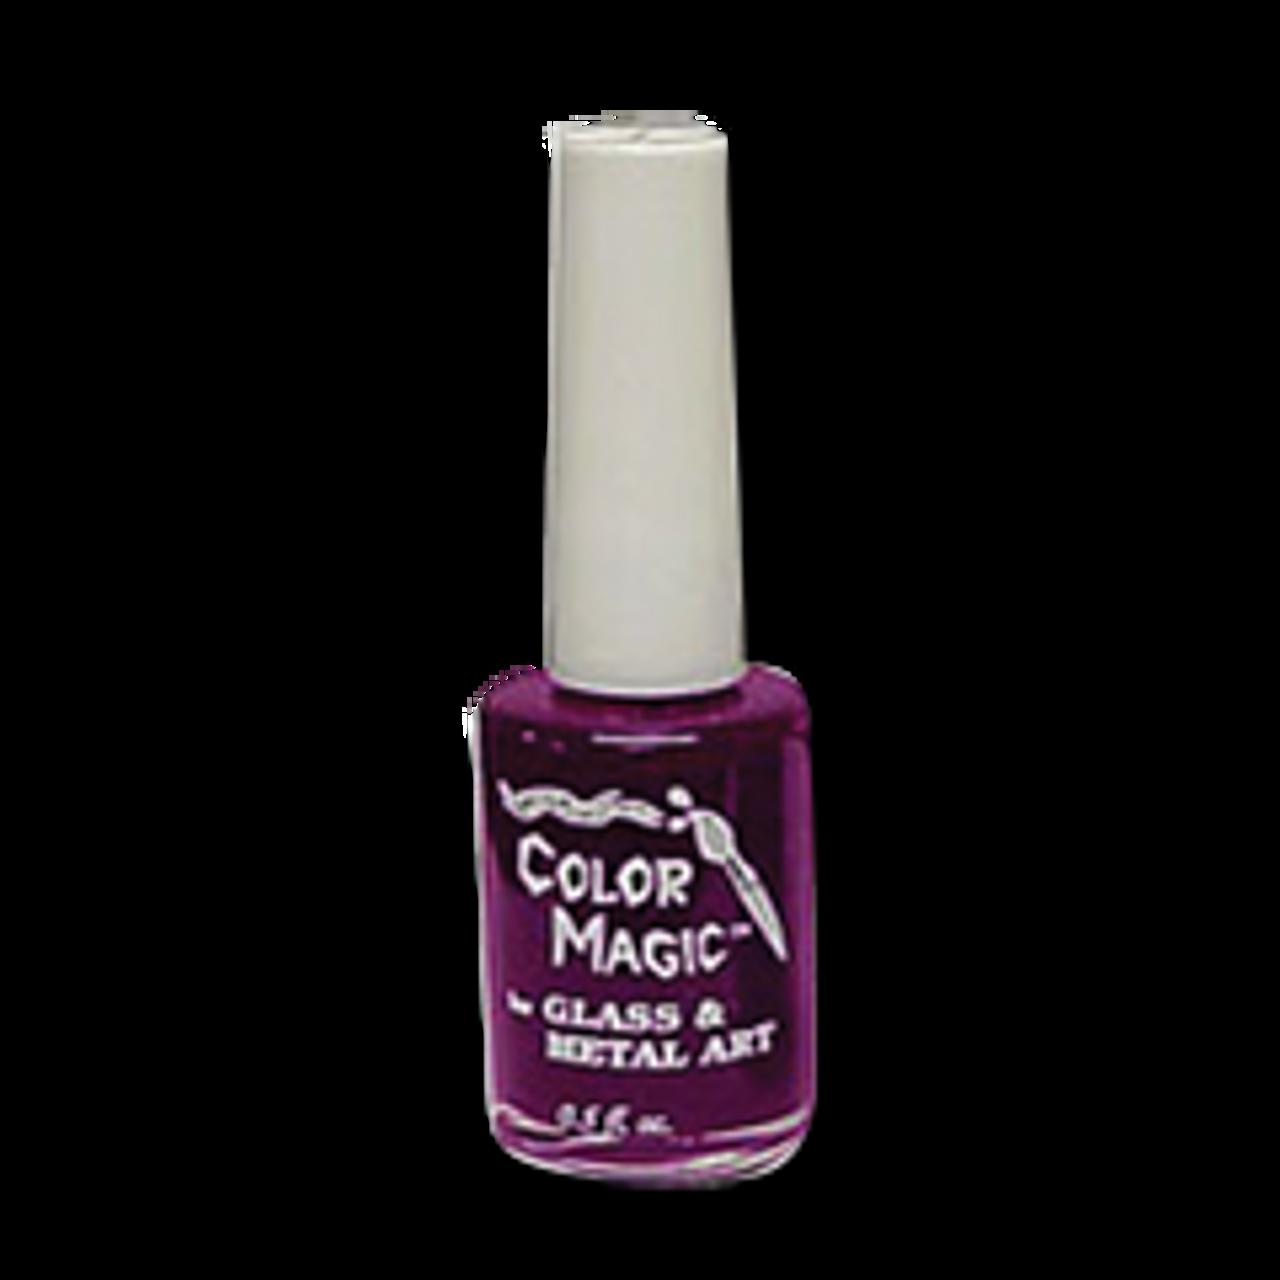 RASPBERRY Translucent Color Magic multi-surface/glass paint